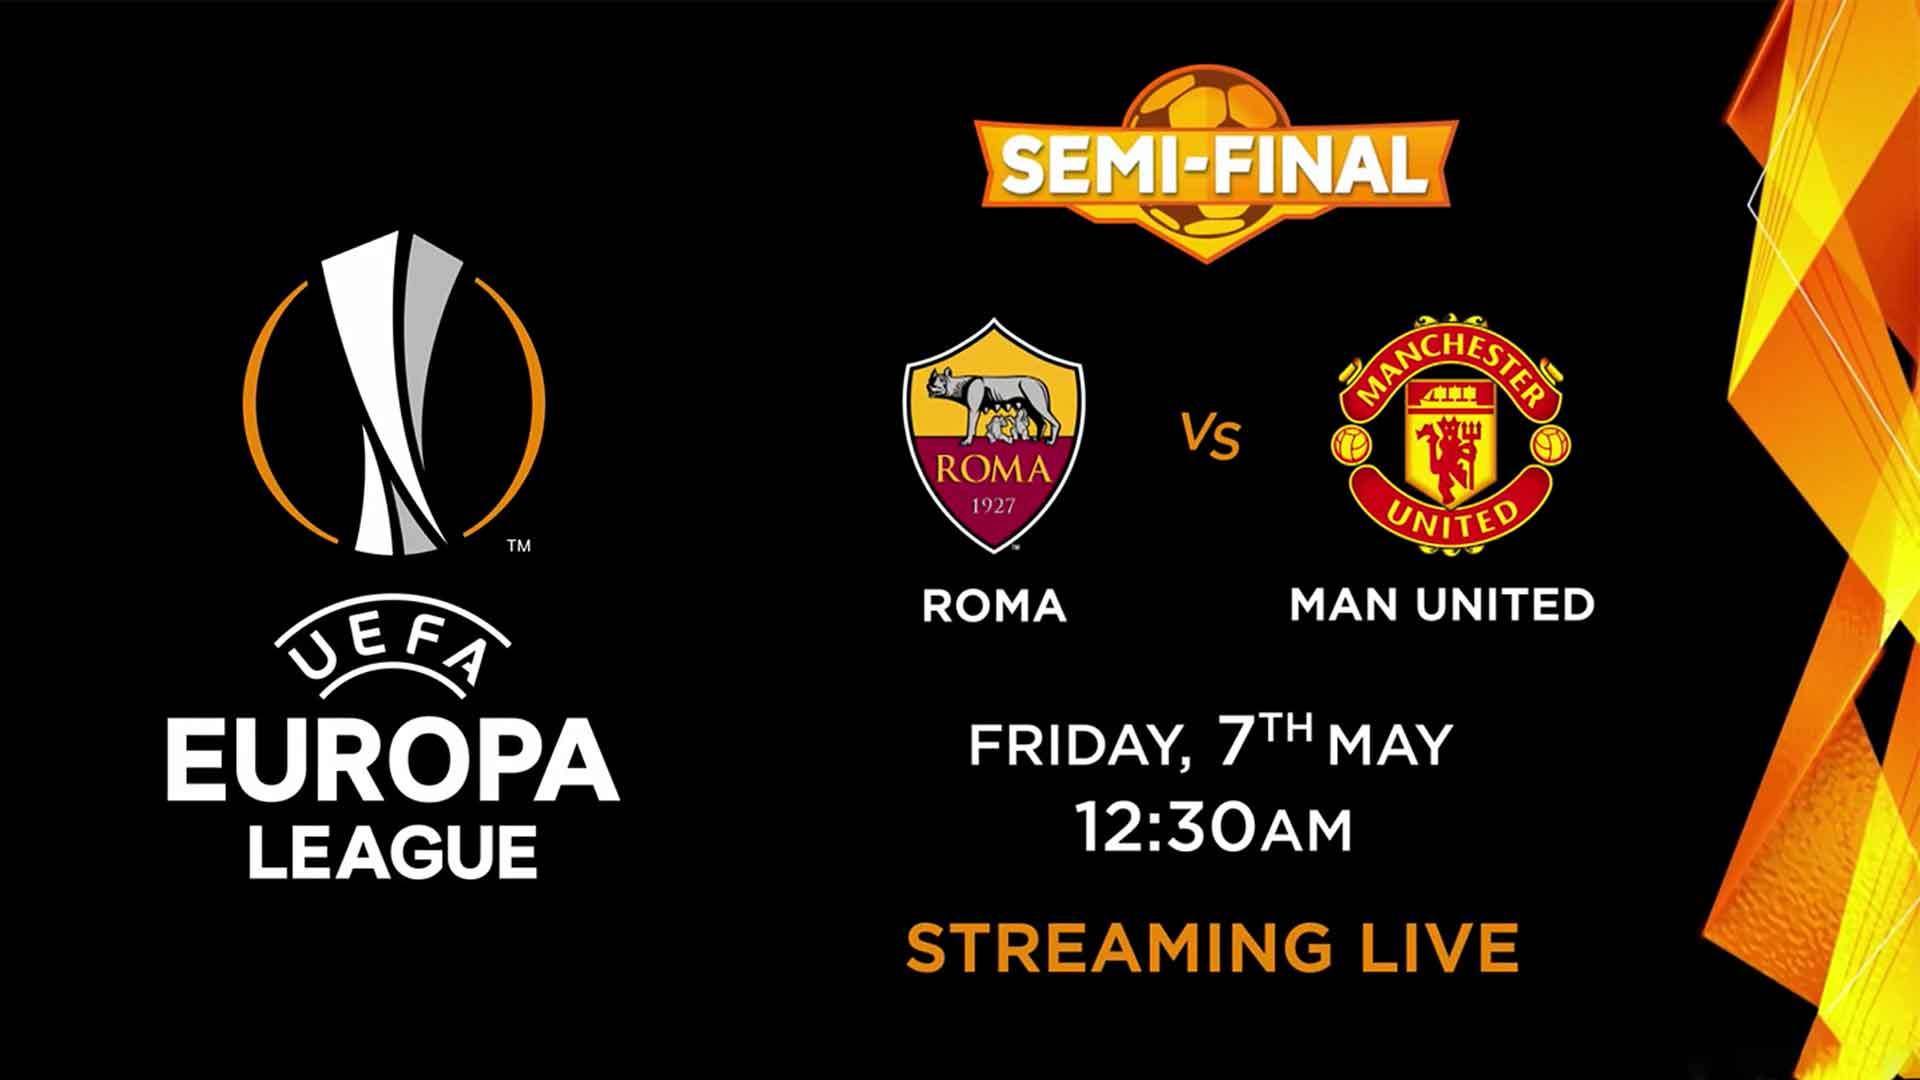 roma vs man united - photo #5